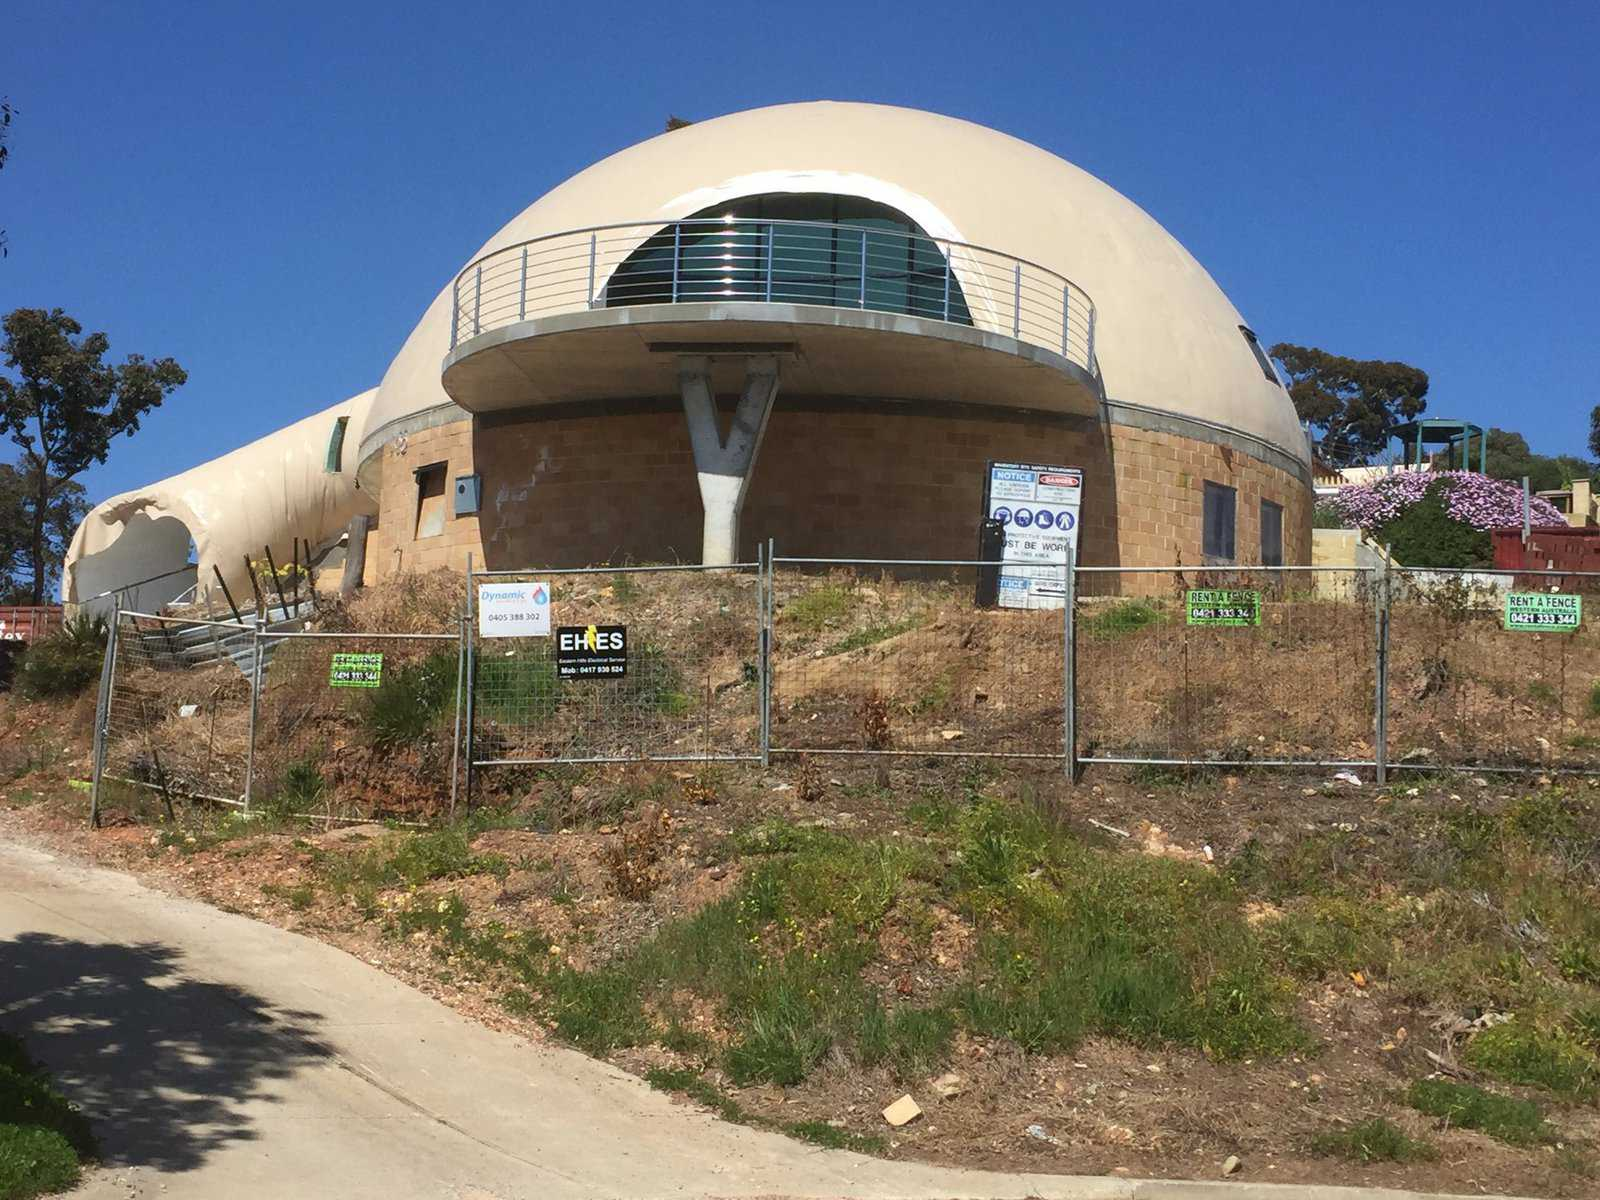 Australian Adventure Nears Completion Monolithic Dome